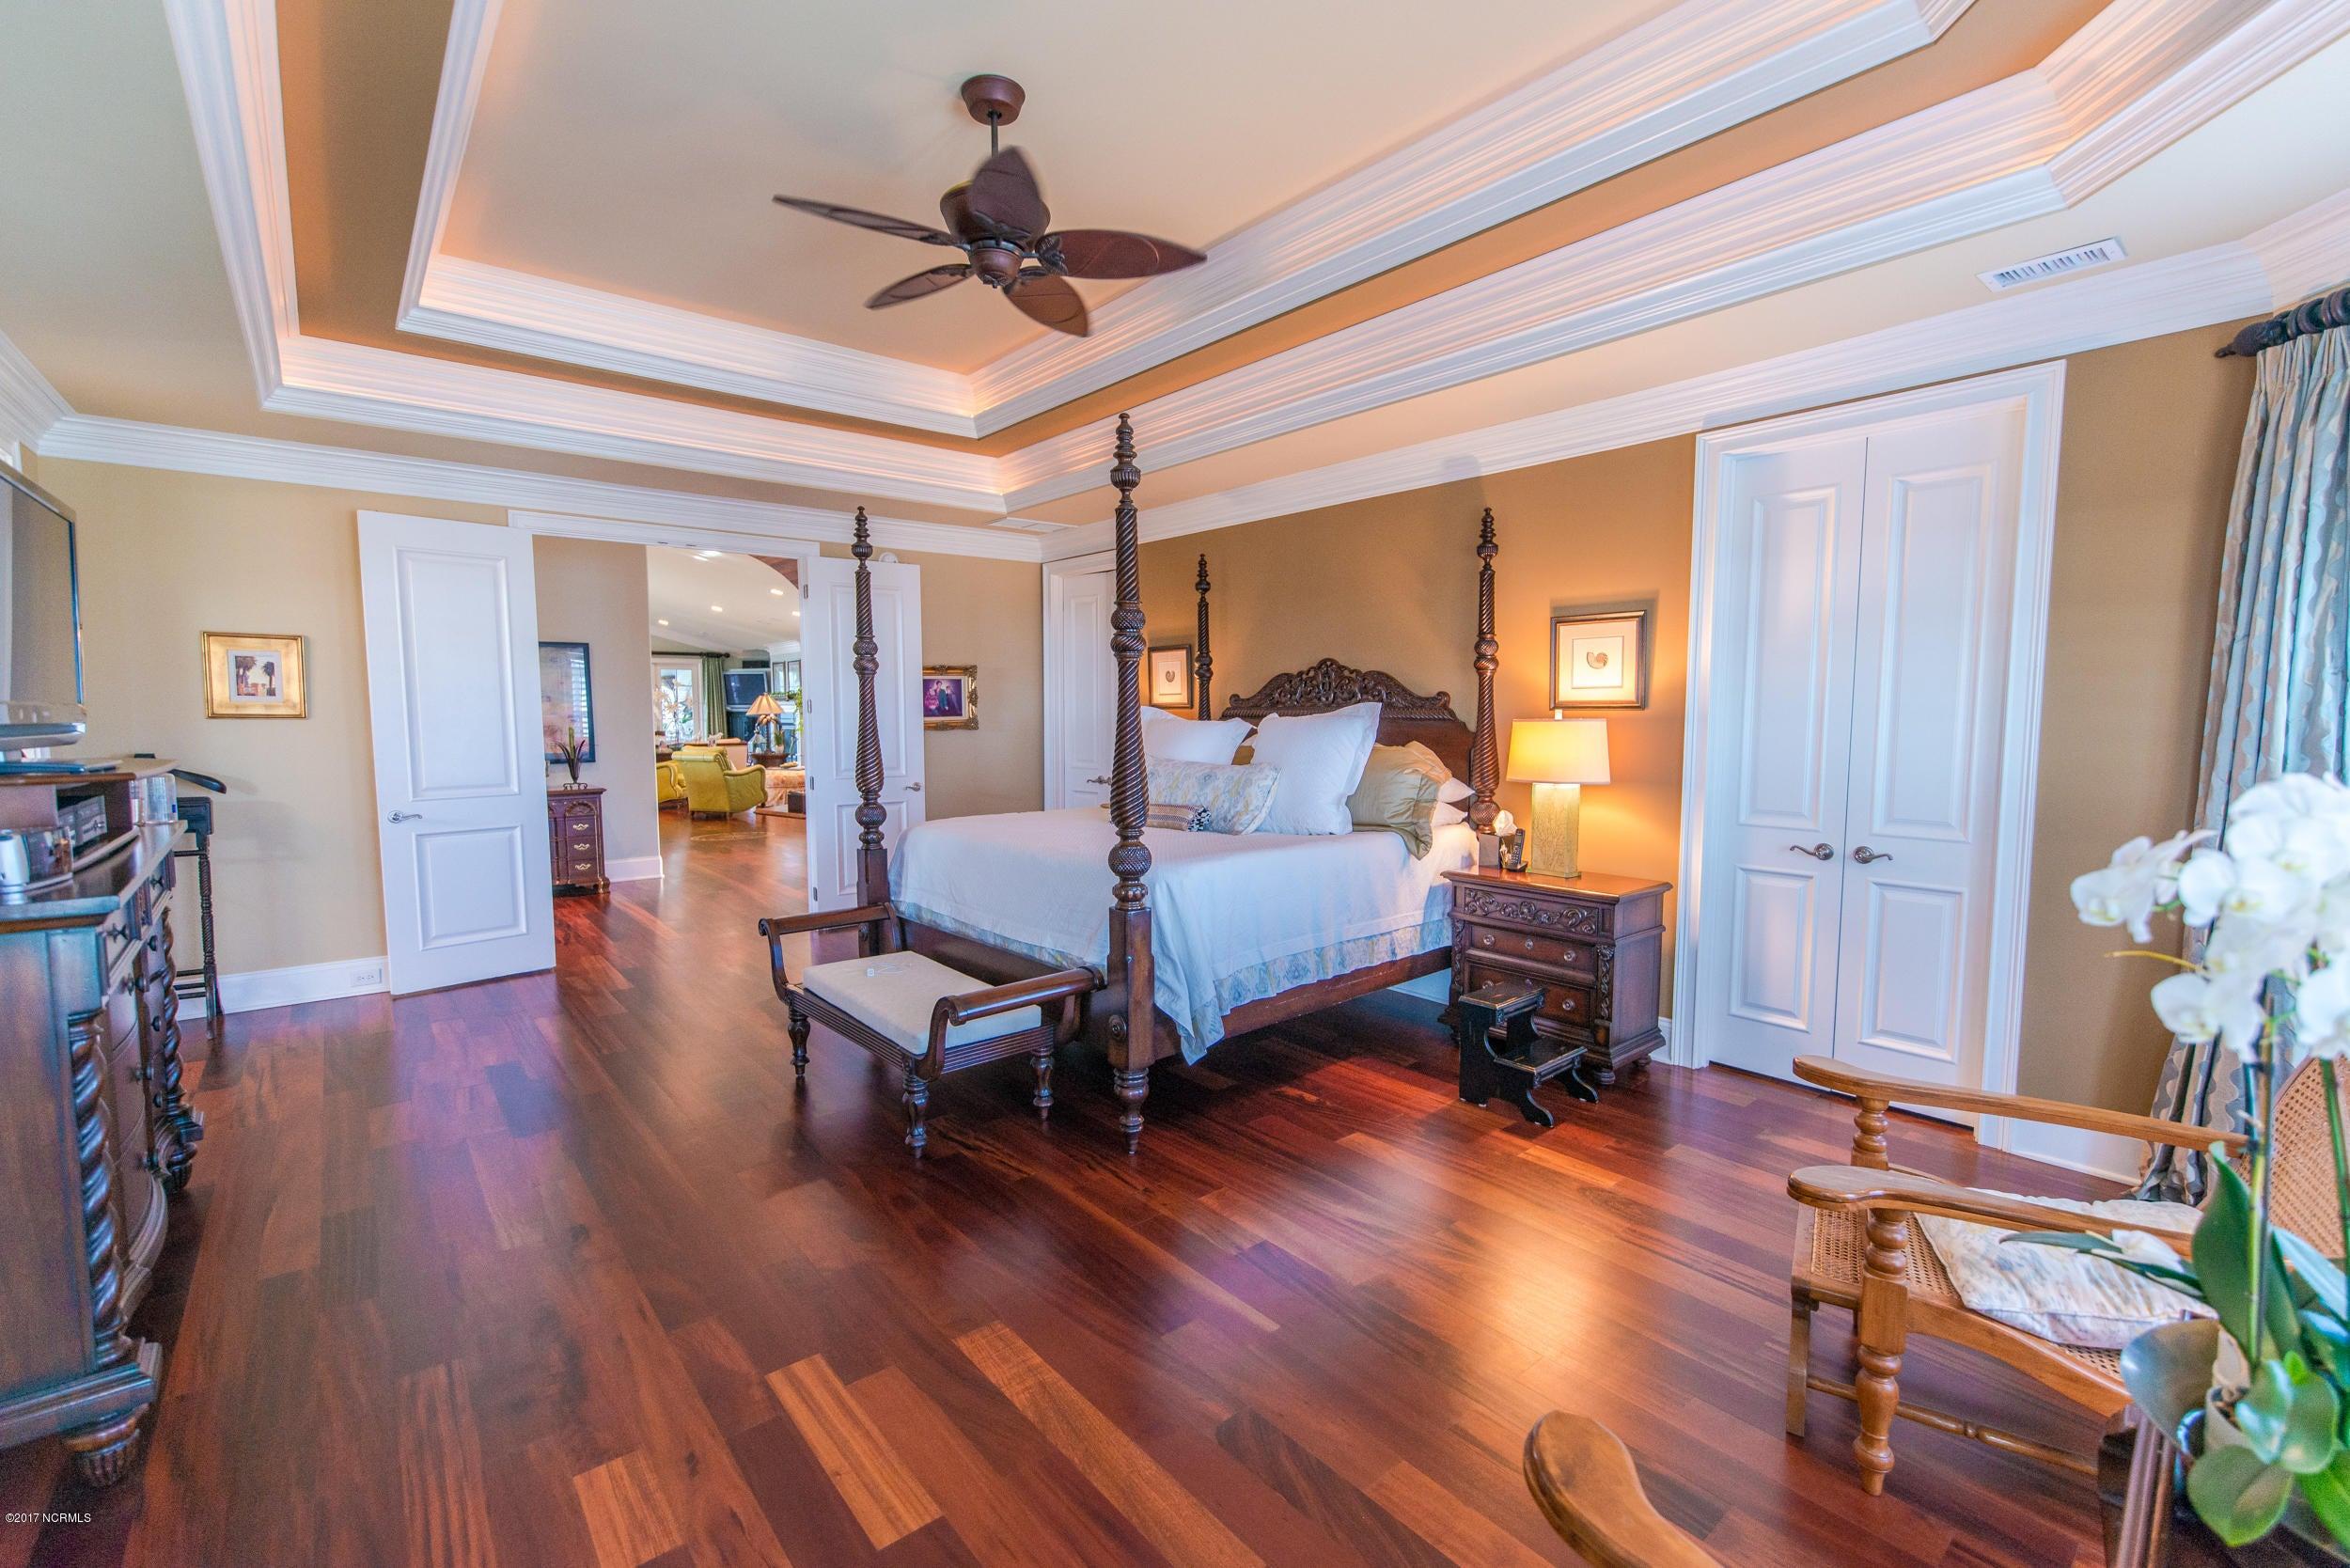 Ocean Isle Beach Real Estate - http://cdn.resize.sparkplatform.com/ncr/1024x768/true/20170829153033205054000000-o.jpg